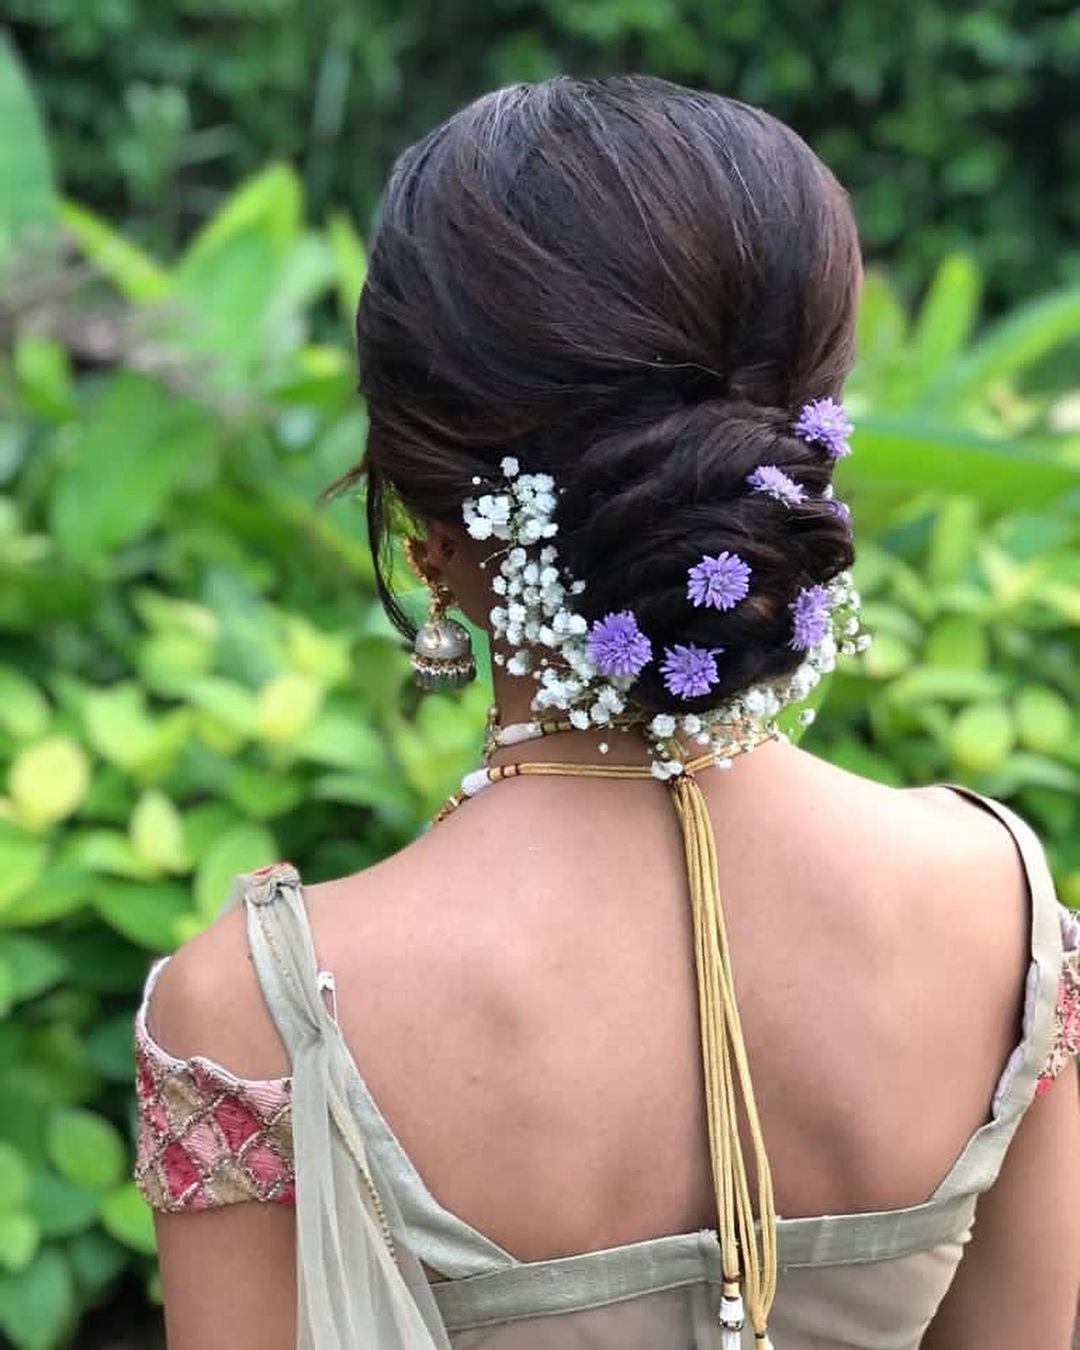 Floral bun hairstyles